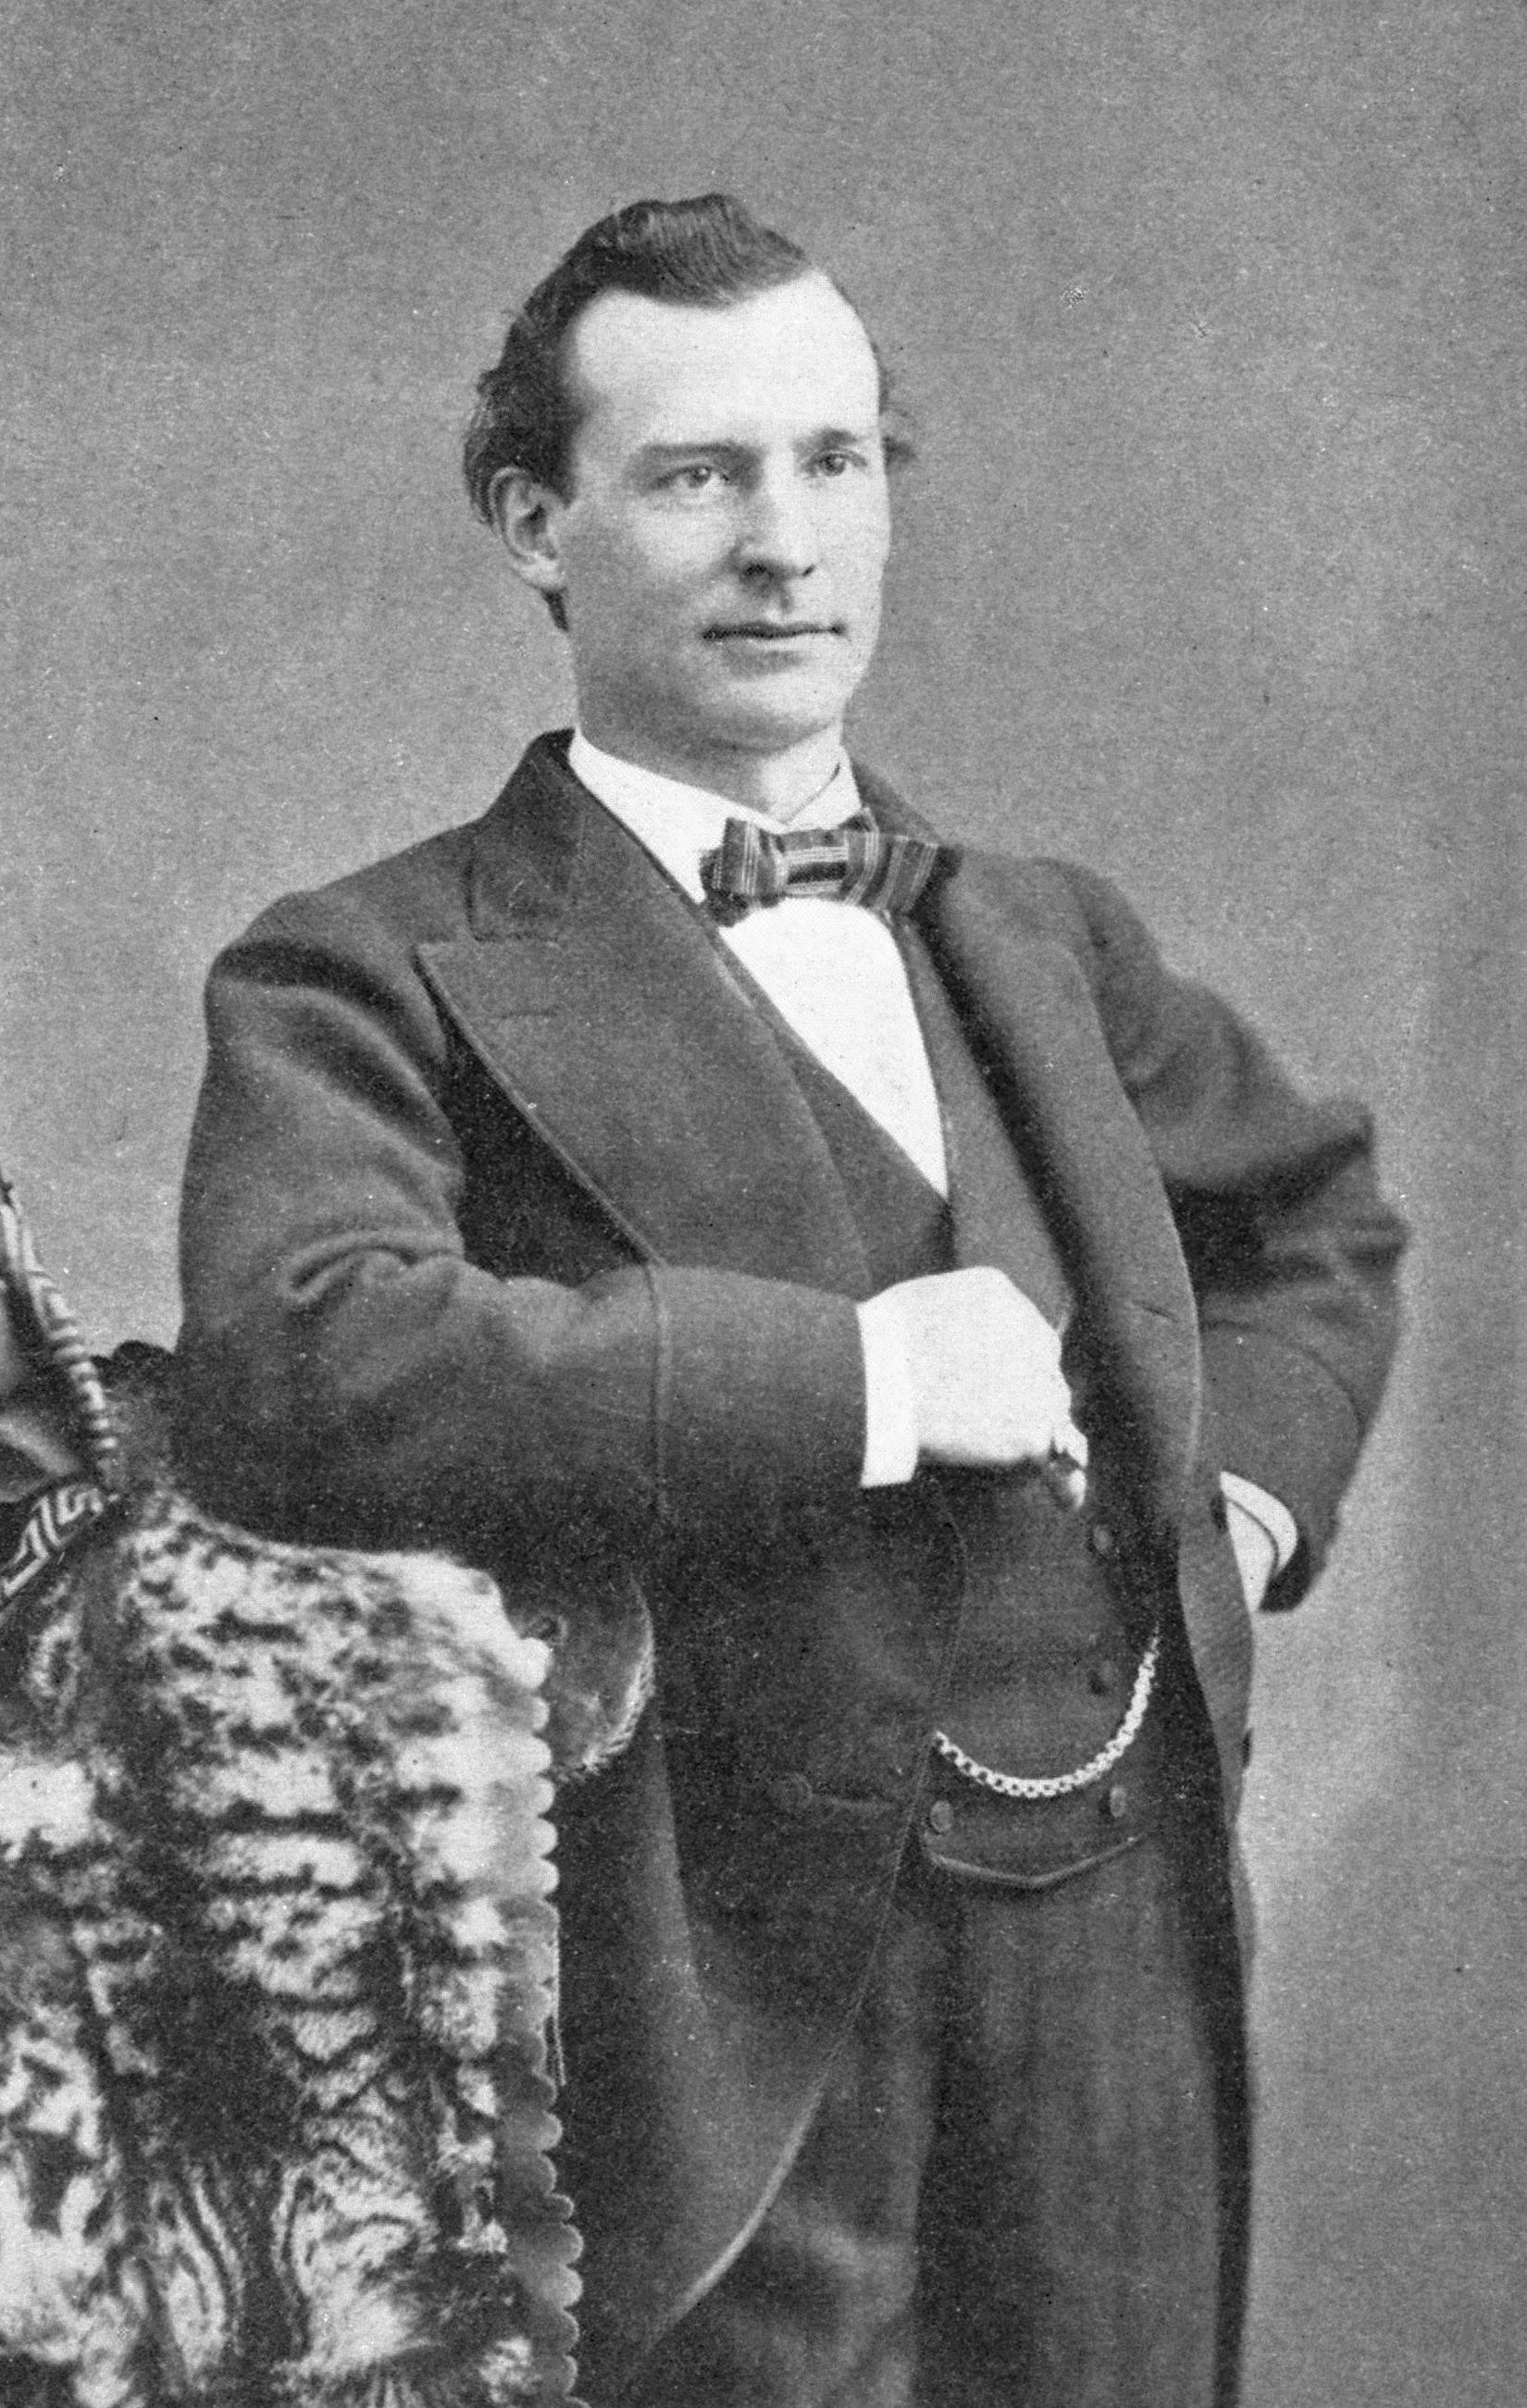 John Edward McCullough